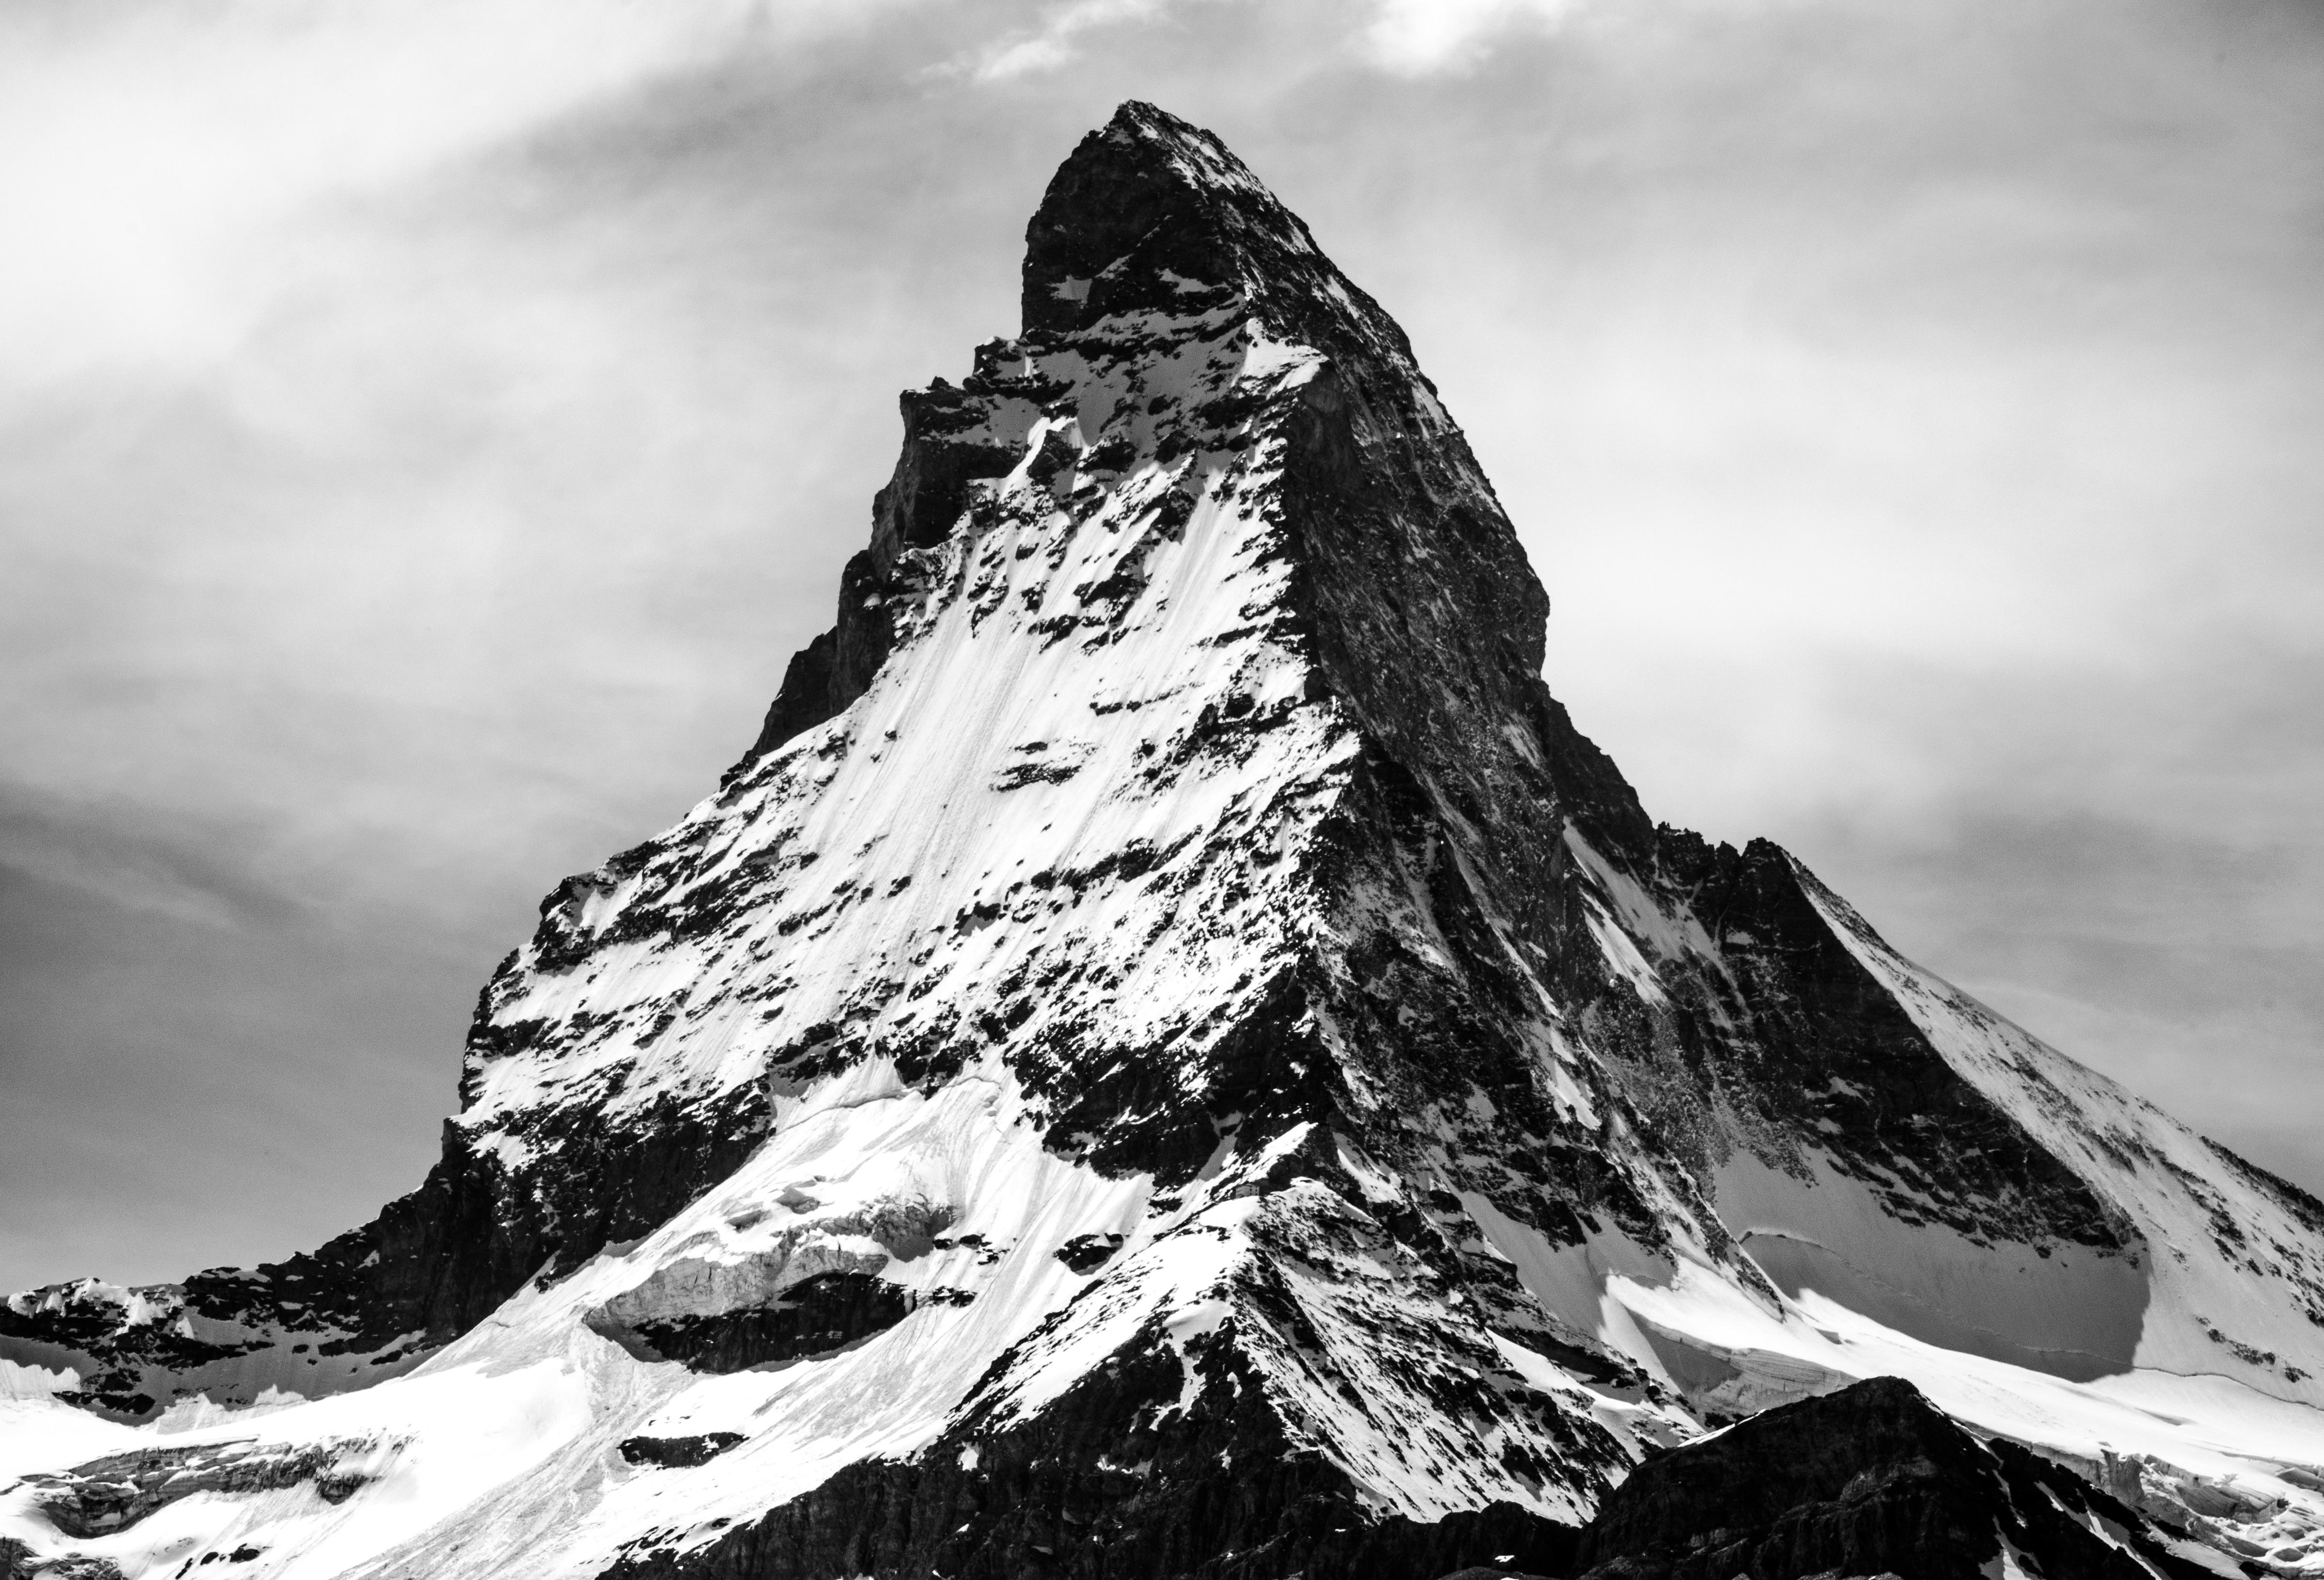 Mountain Top, Altitude, Ice, Landscape, Mountain, HQ Photo